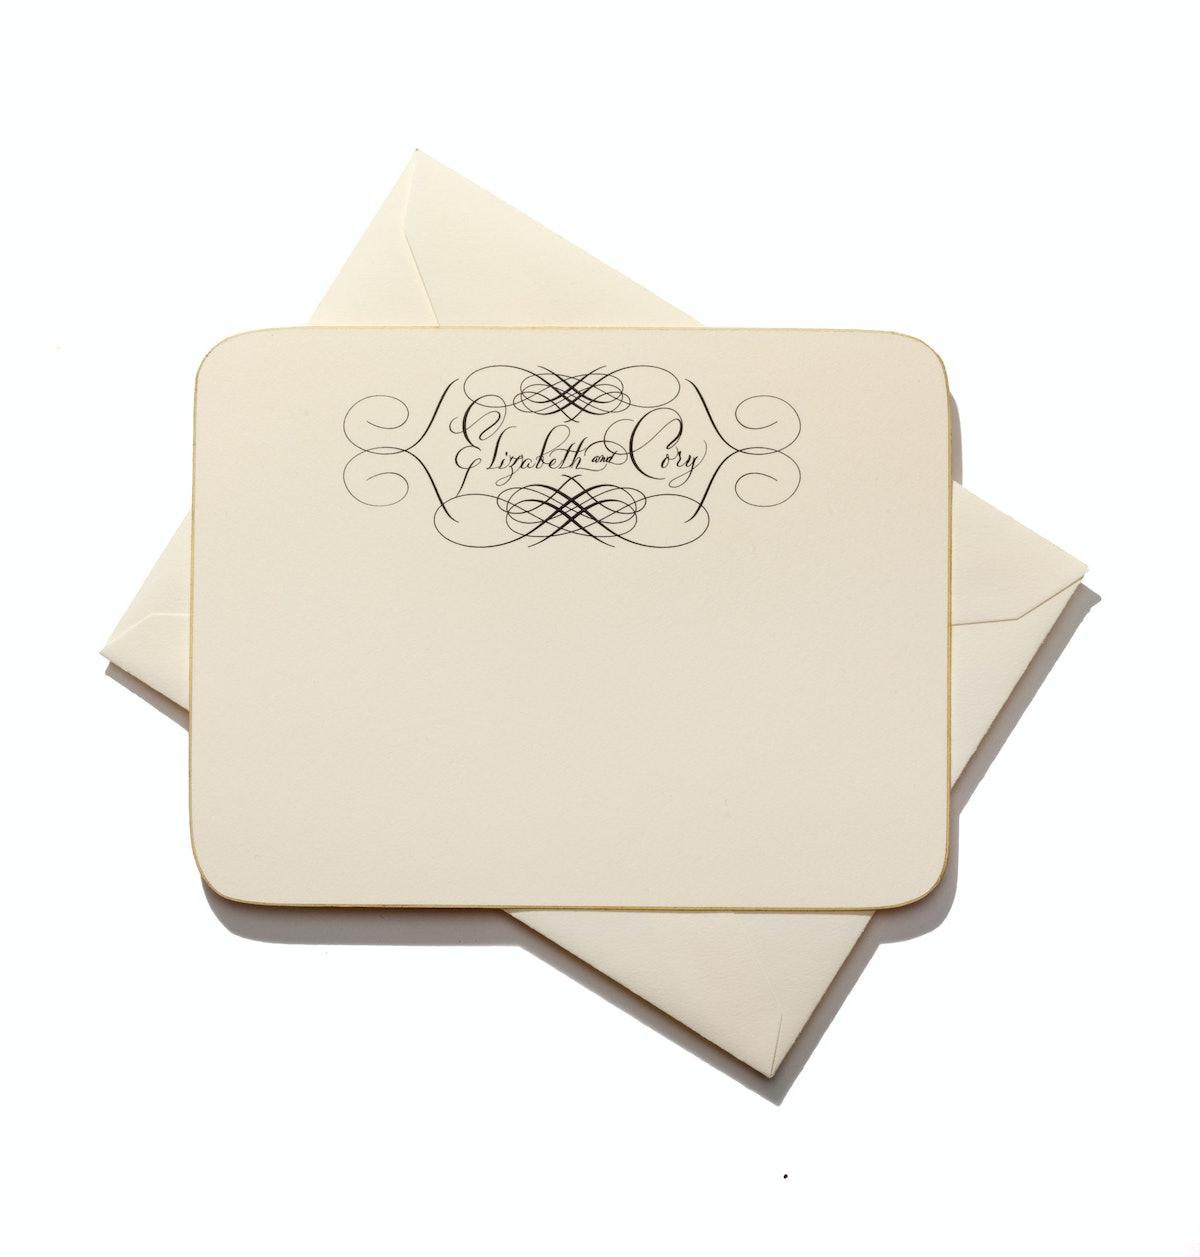 Bernard Maisner Calligraphy and Fine Stationery custom stationery, starting at $1,200 for set of 100...